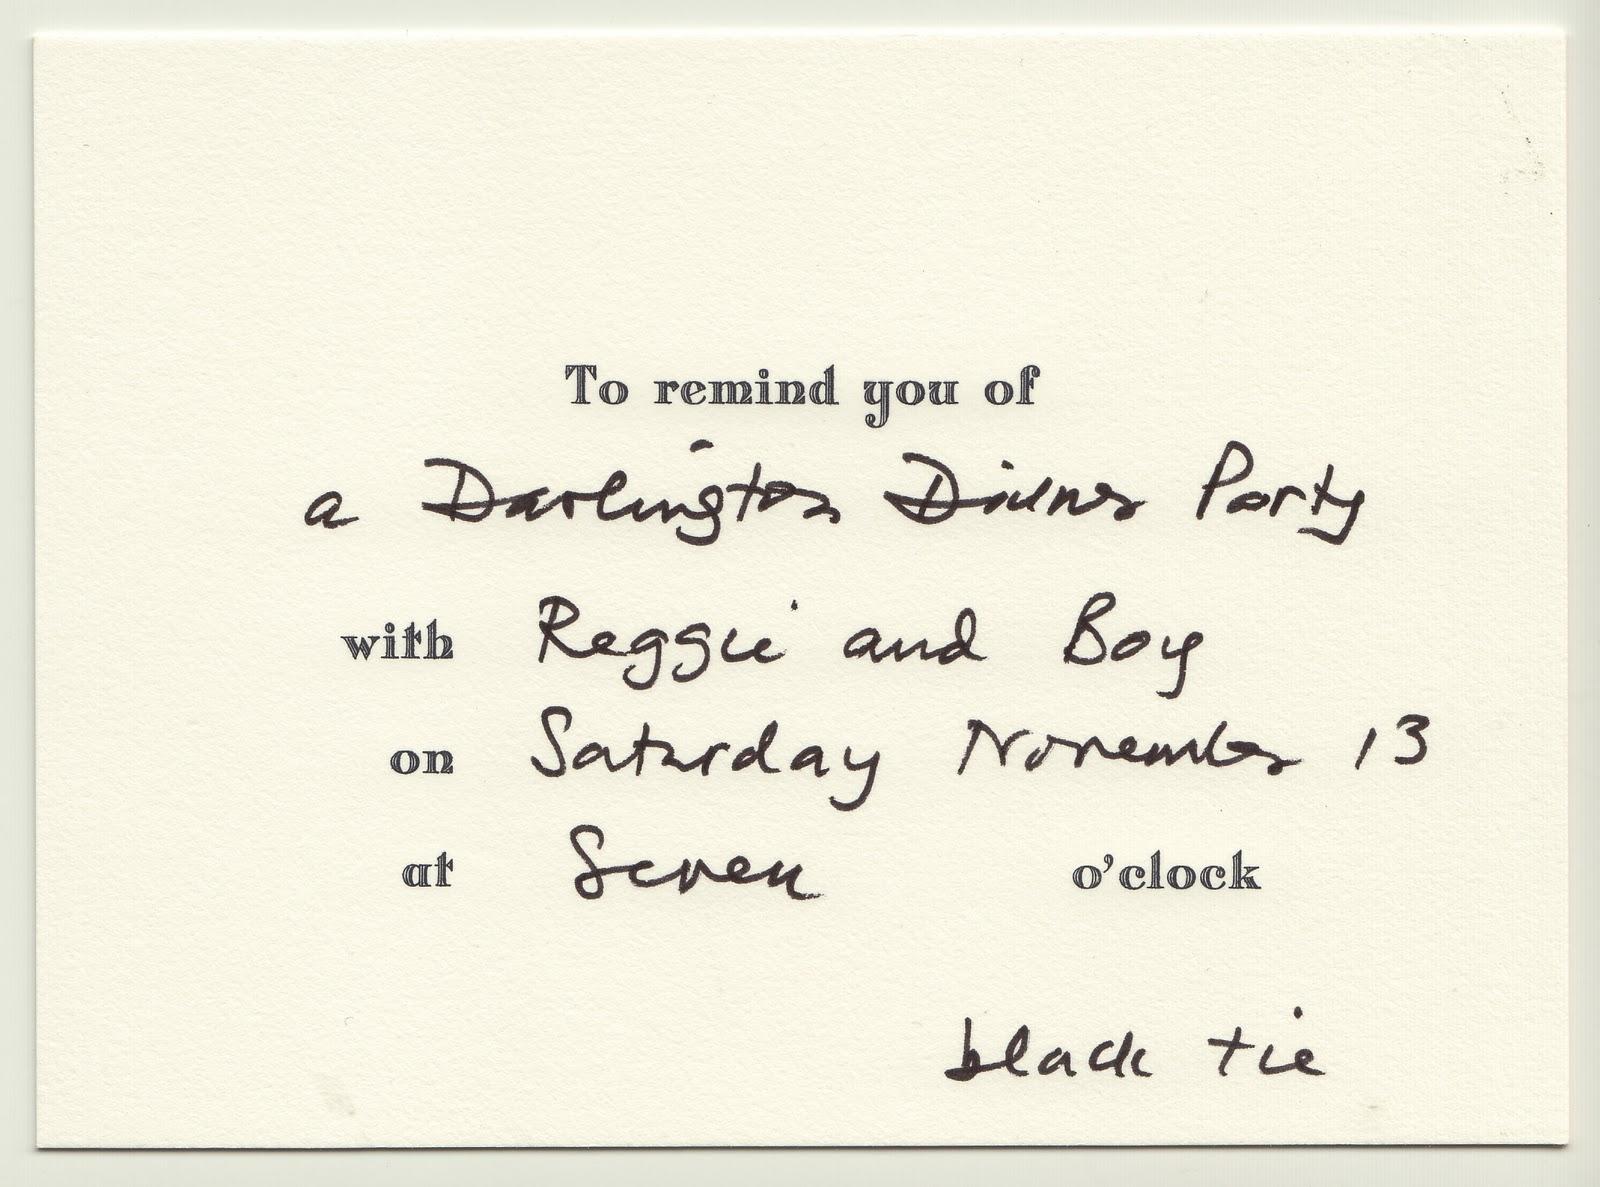 Reggie Darling An Autumn Black Tie Dinner At Darlington